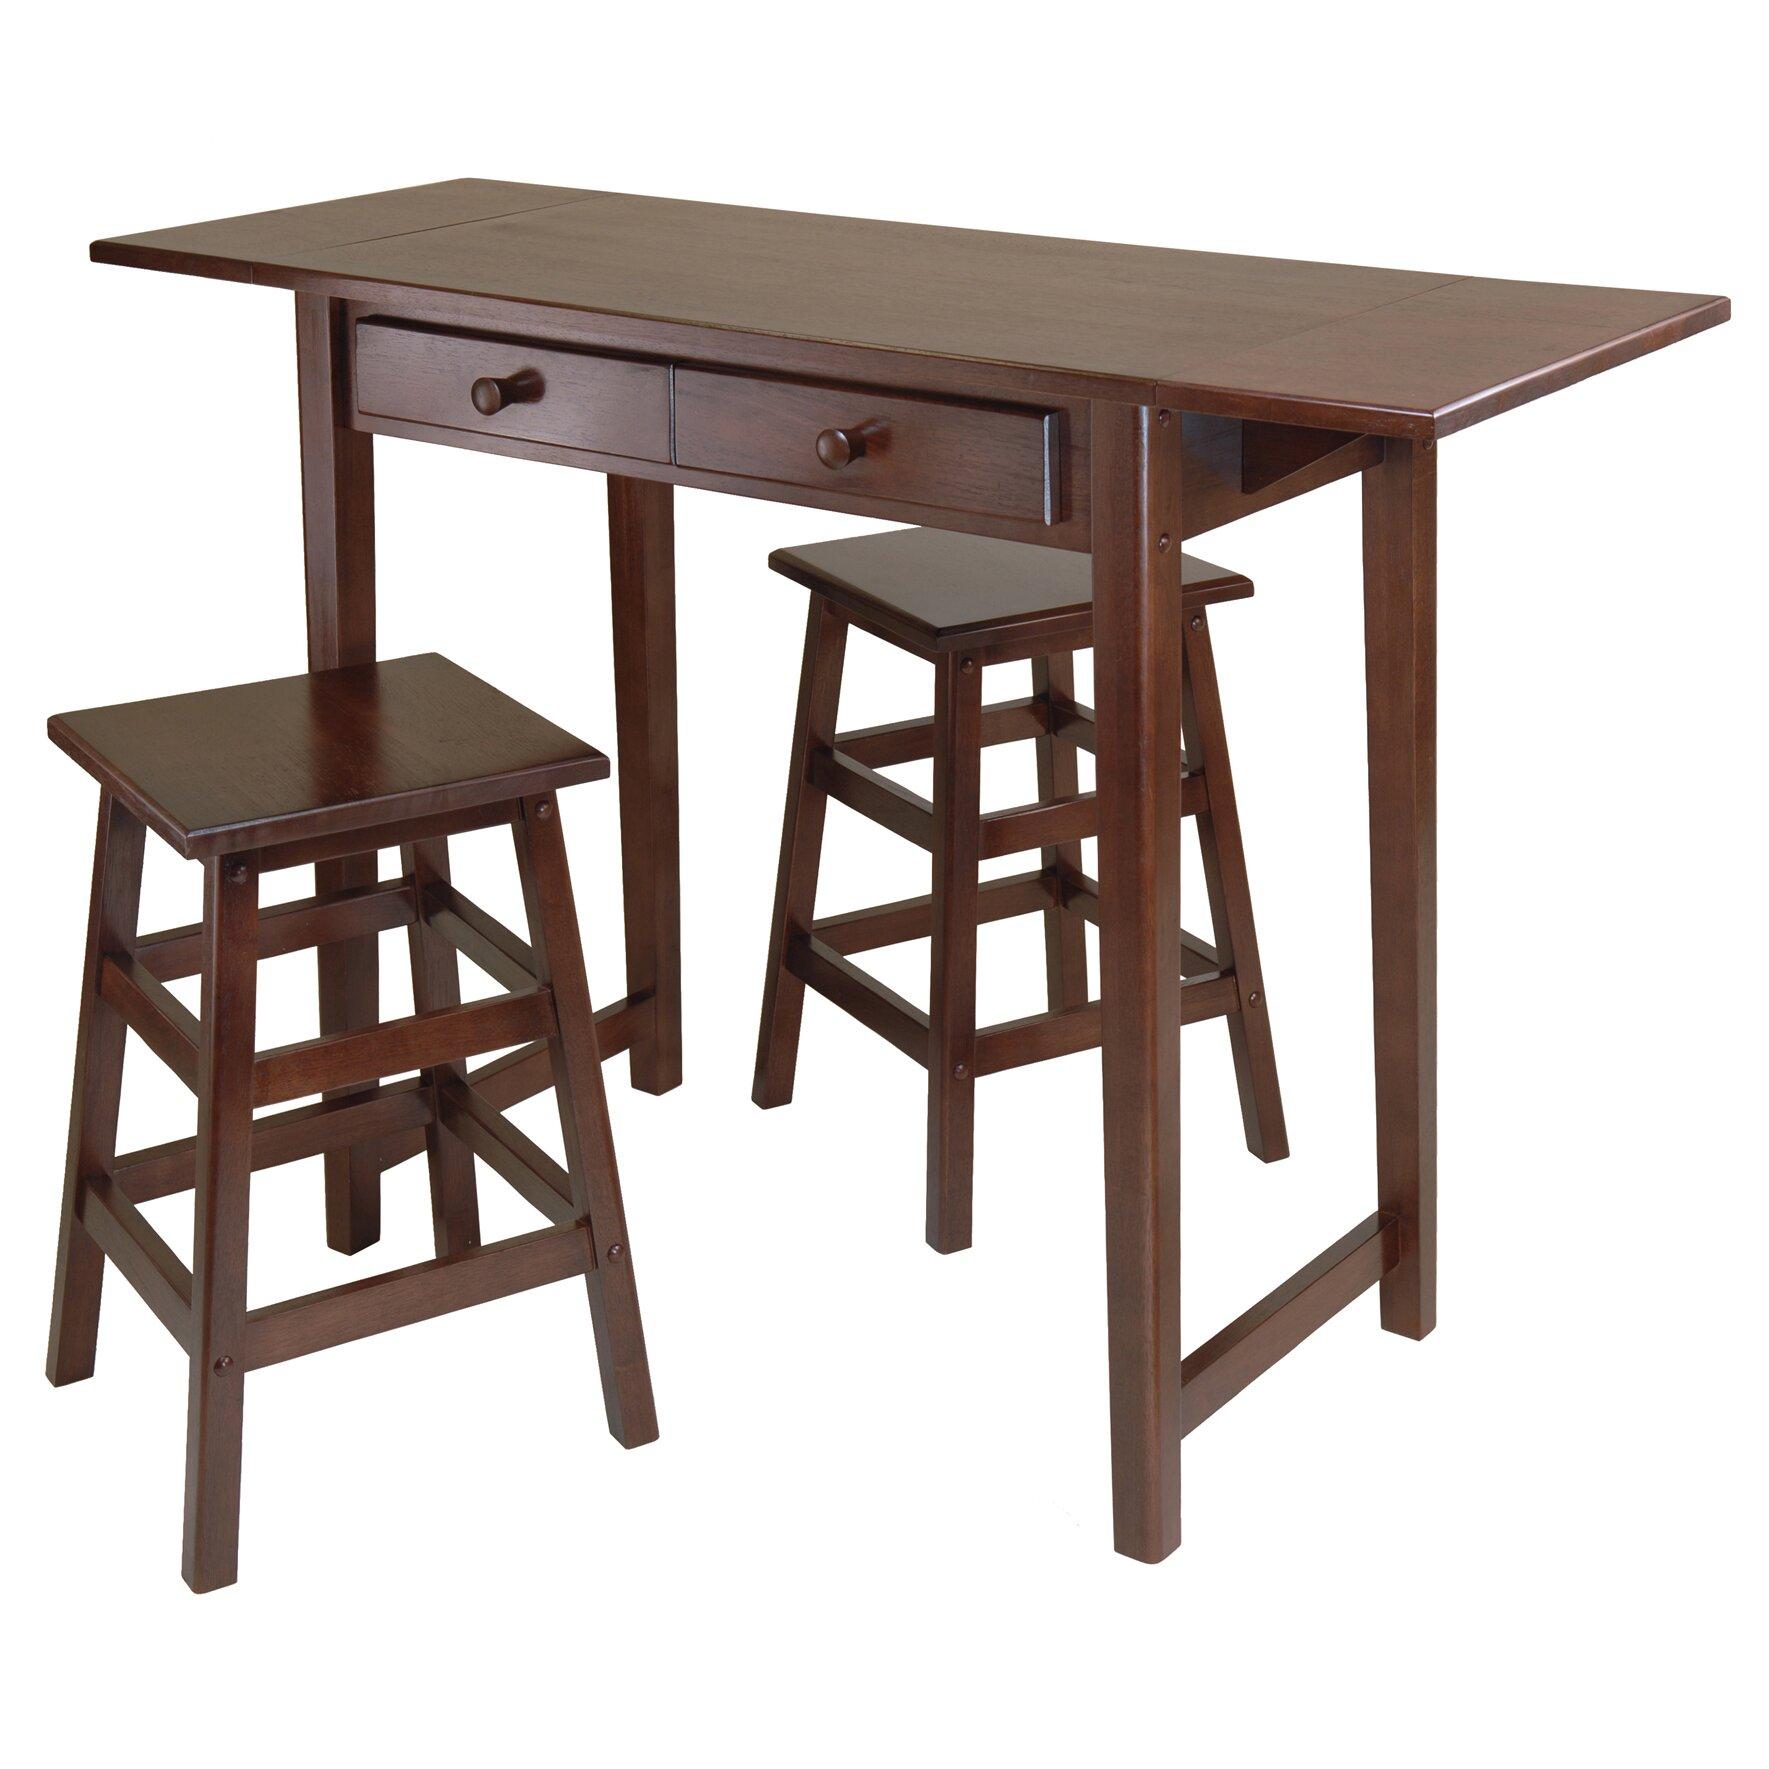 winsome mercer 3 piece dining set reviews wayfair. Black Bedroom Furniture Sets. Home Design Ideas